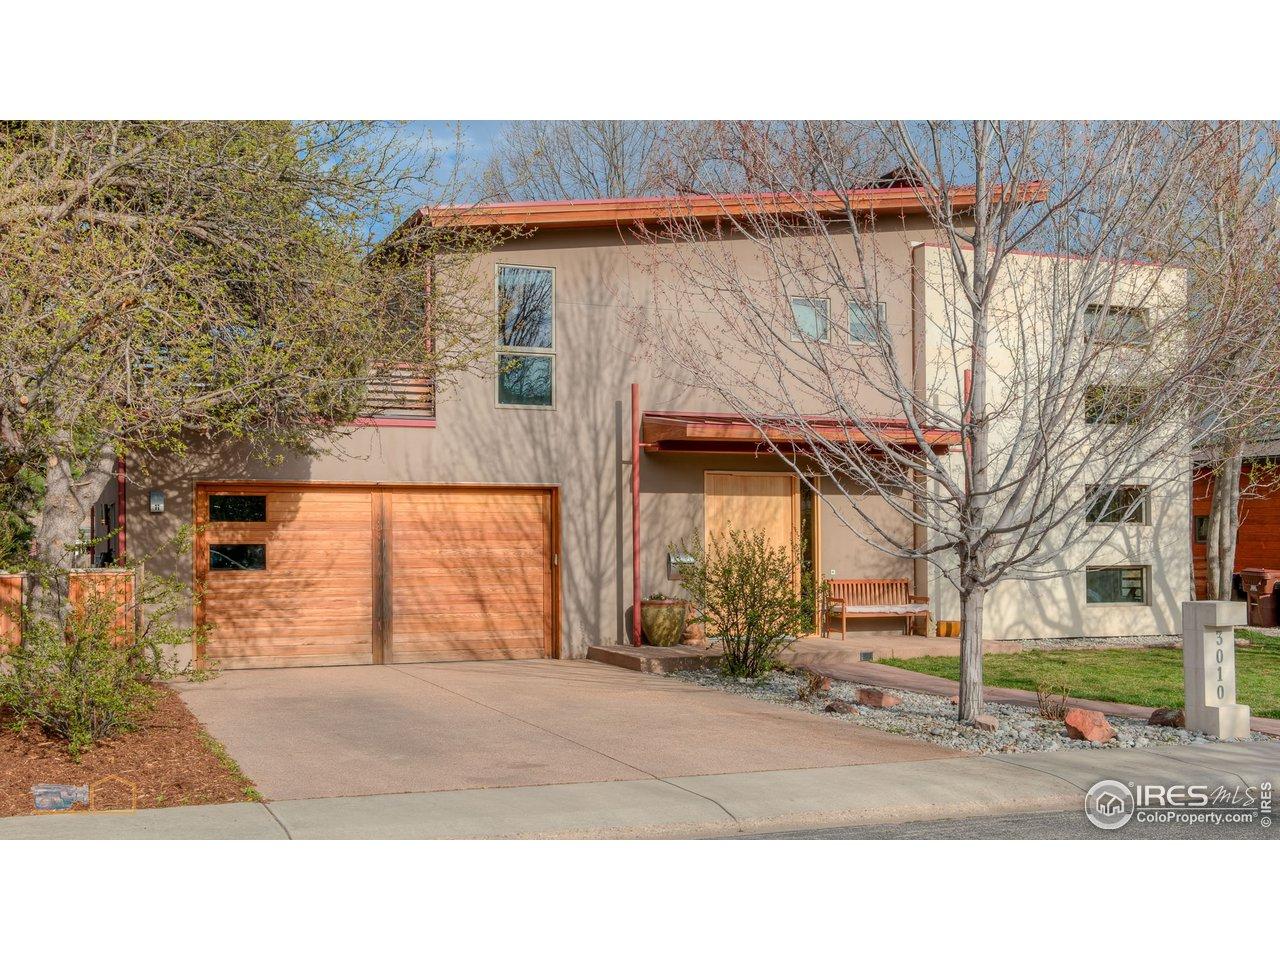 3010 Washington St, Boulder CO 80304